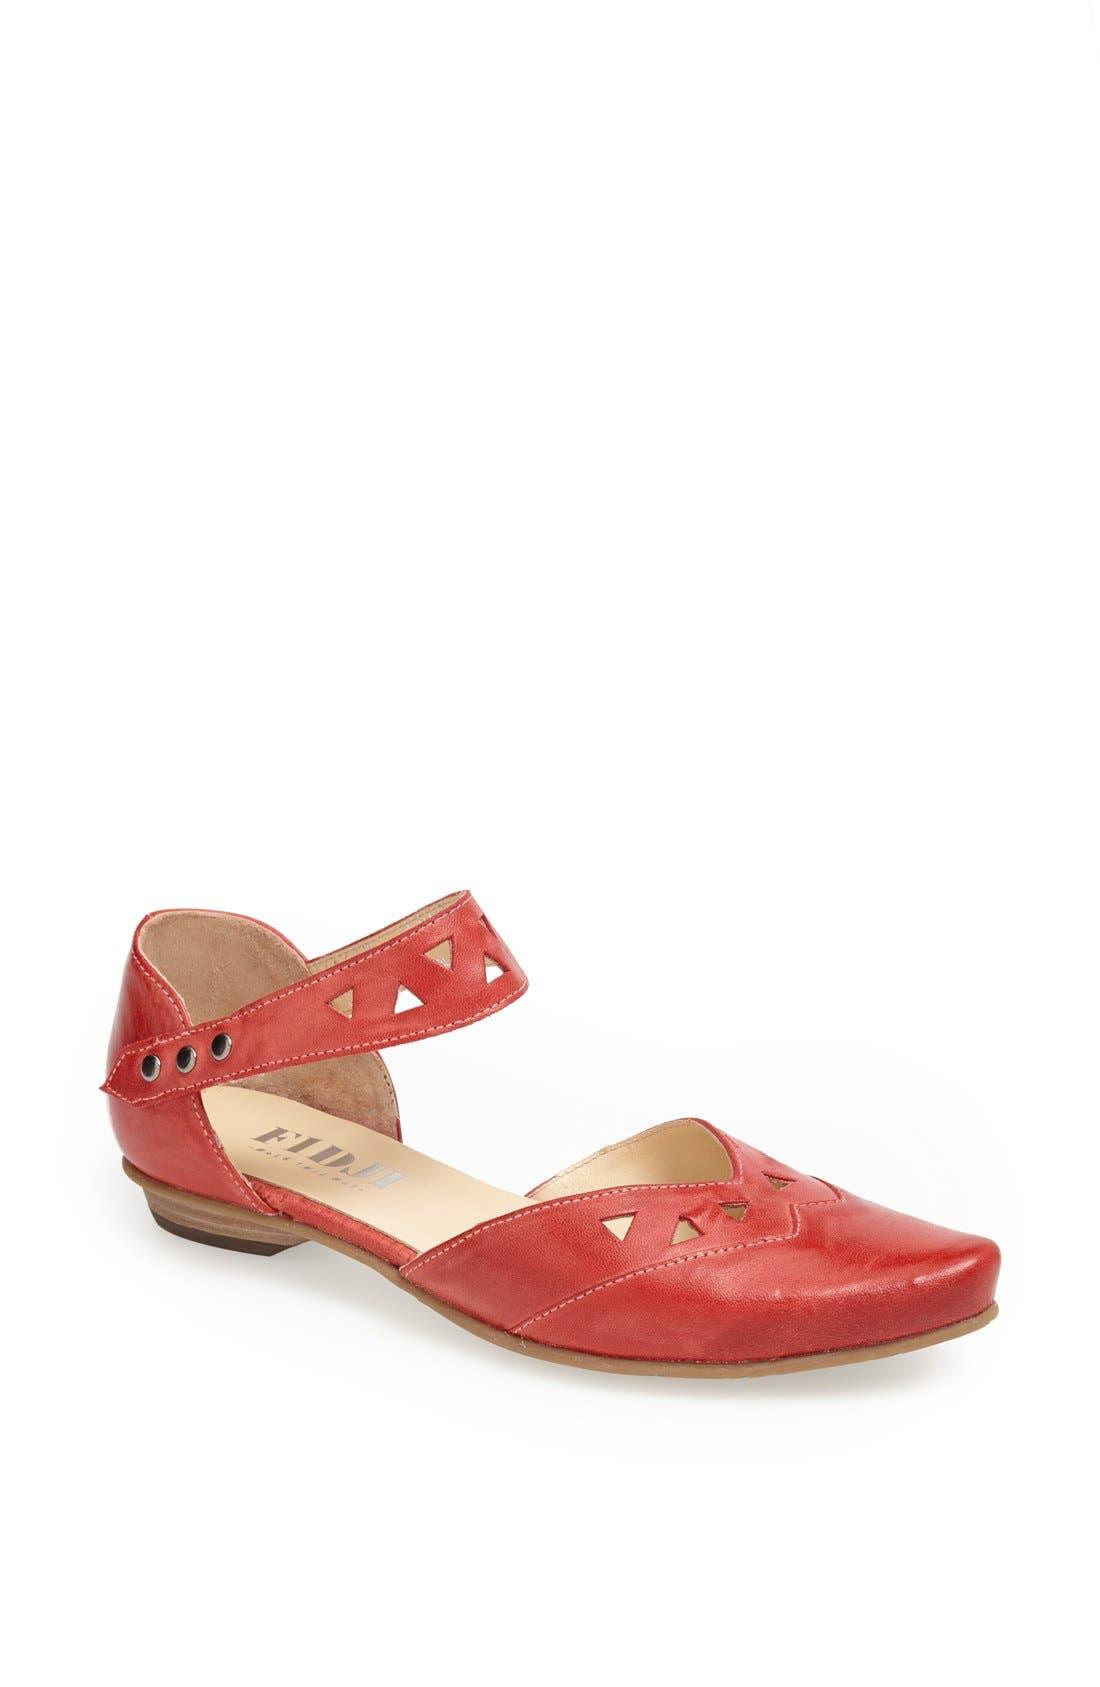 Main Image - Fidji Ankle Strap d'Orsay Flat